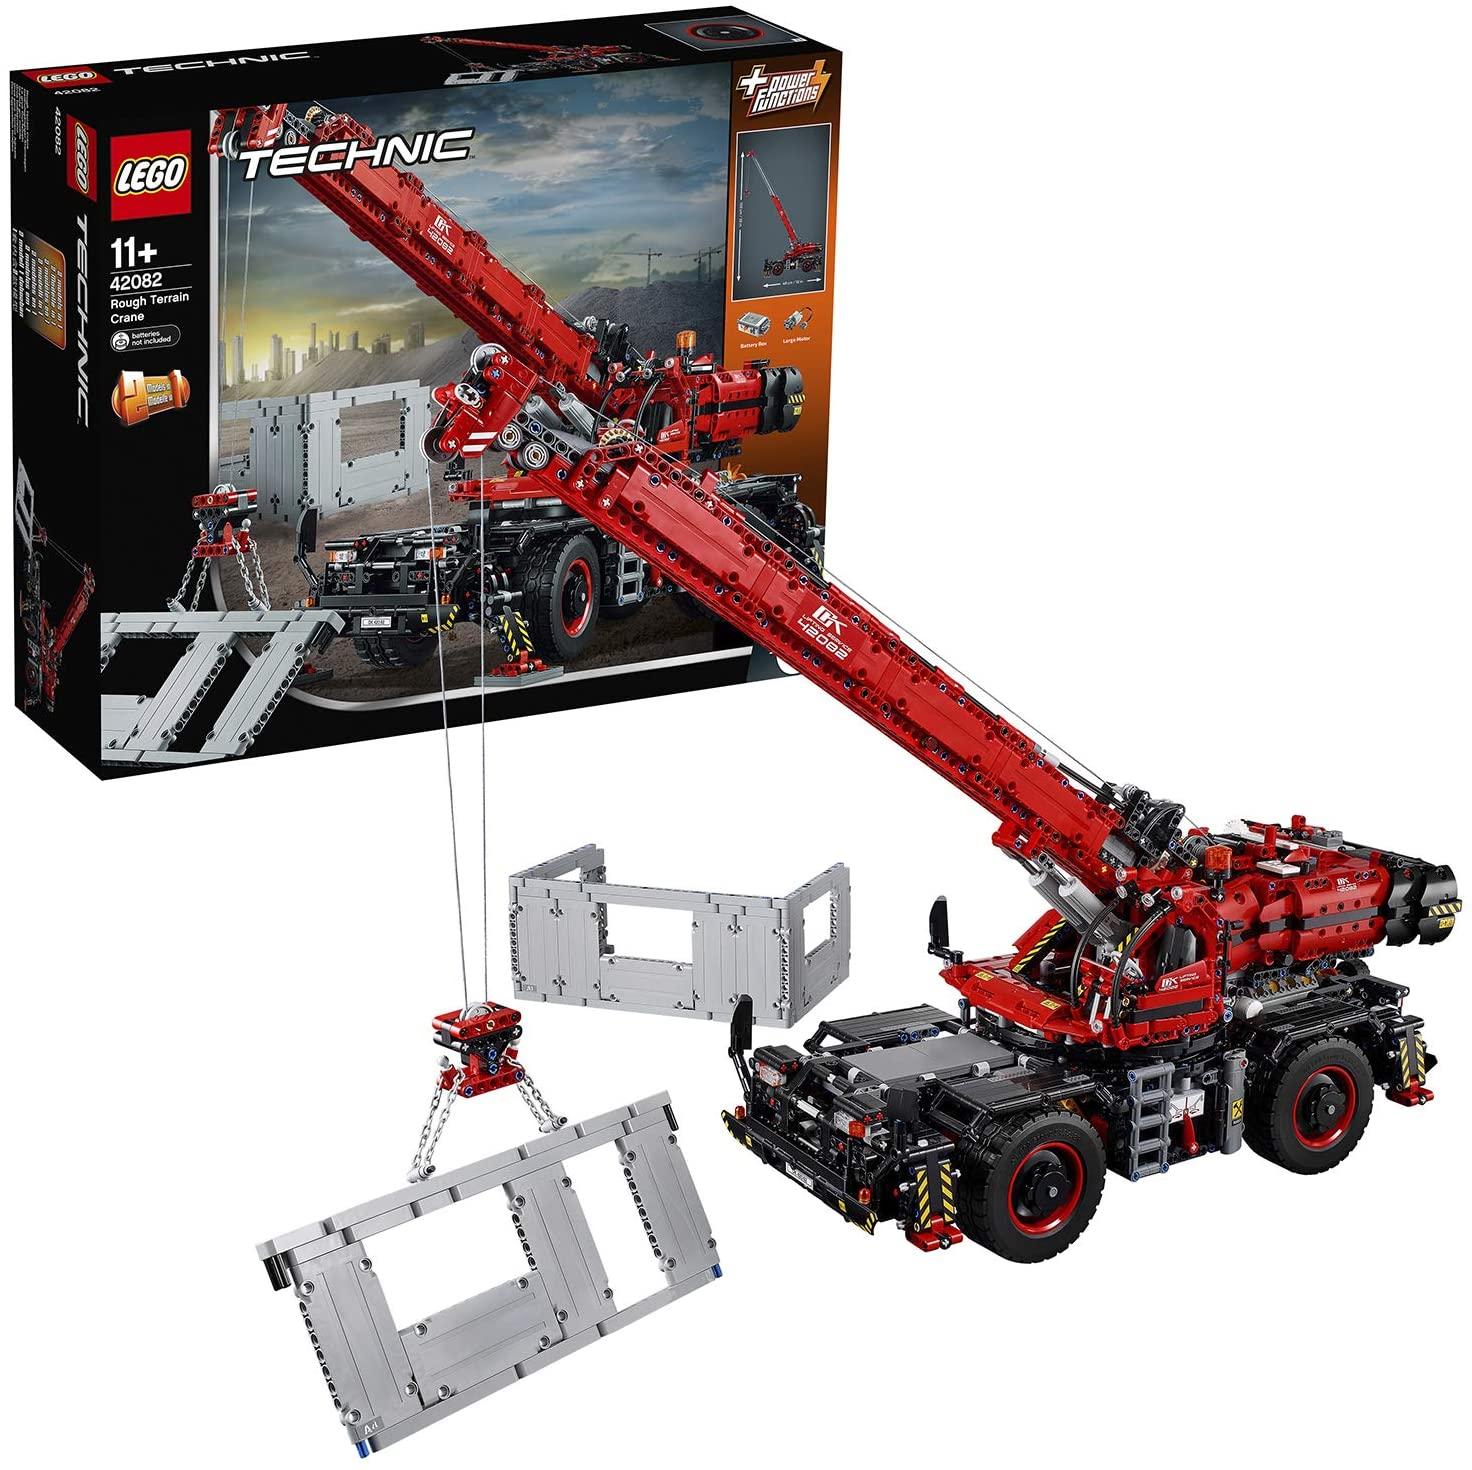 Lego Technic 42082 - La grue tout terrain